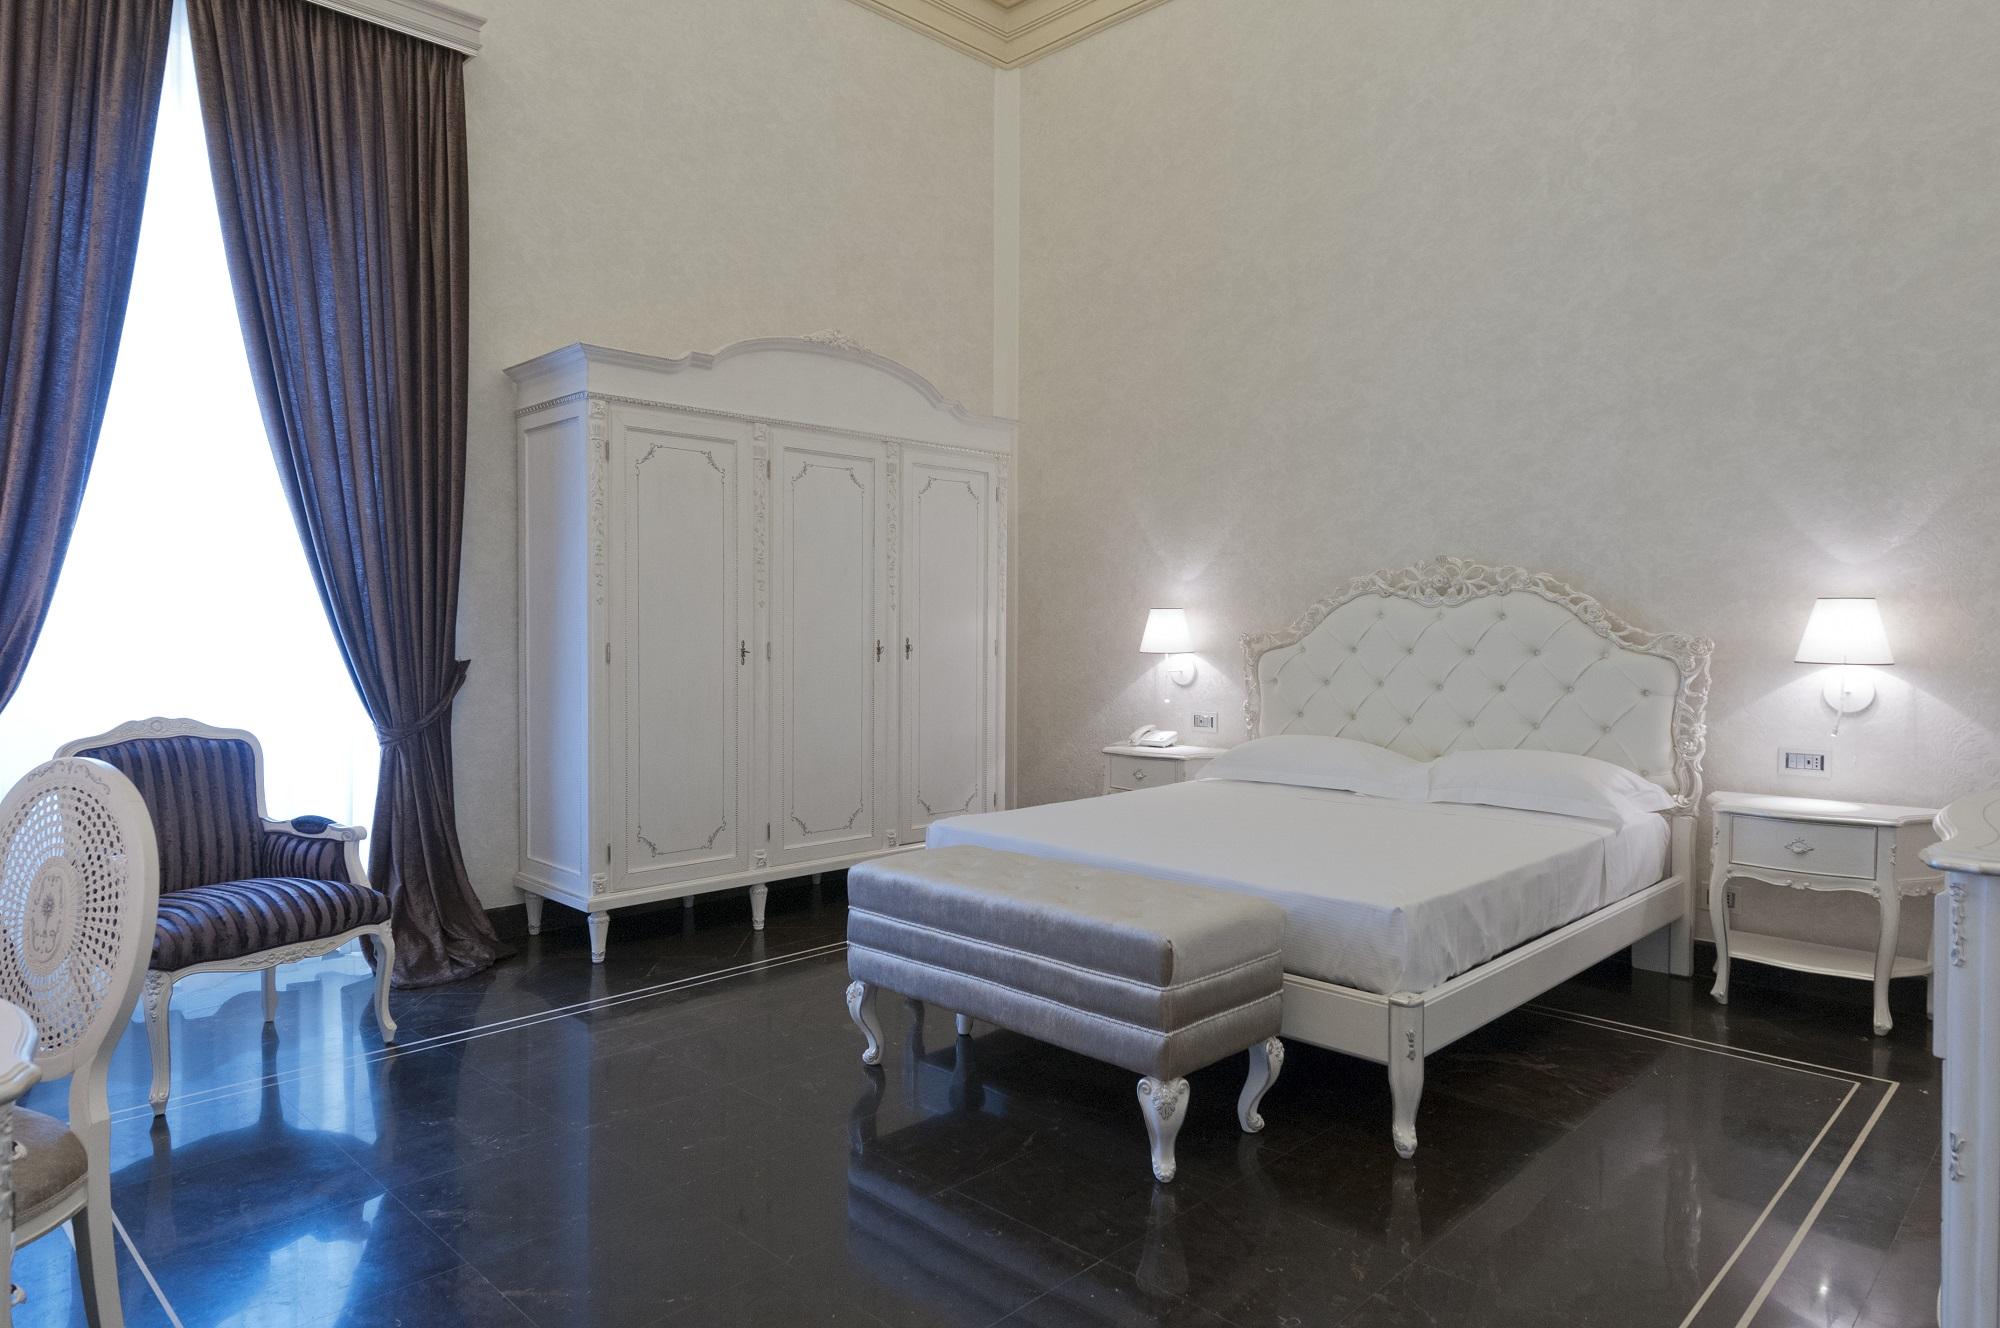 albergo patane 2